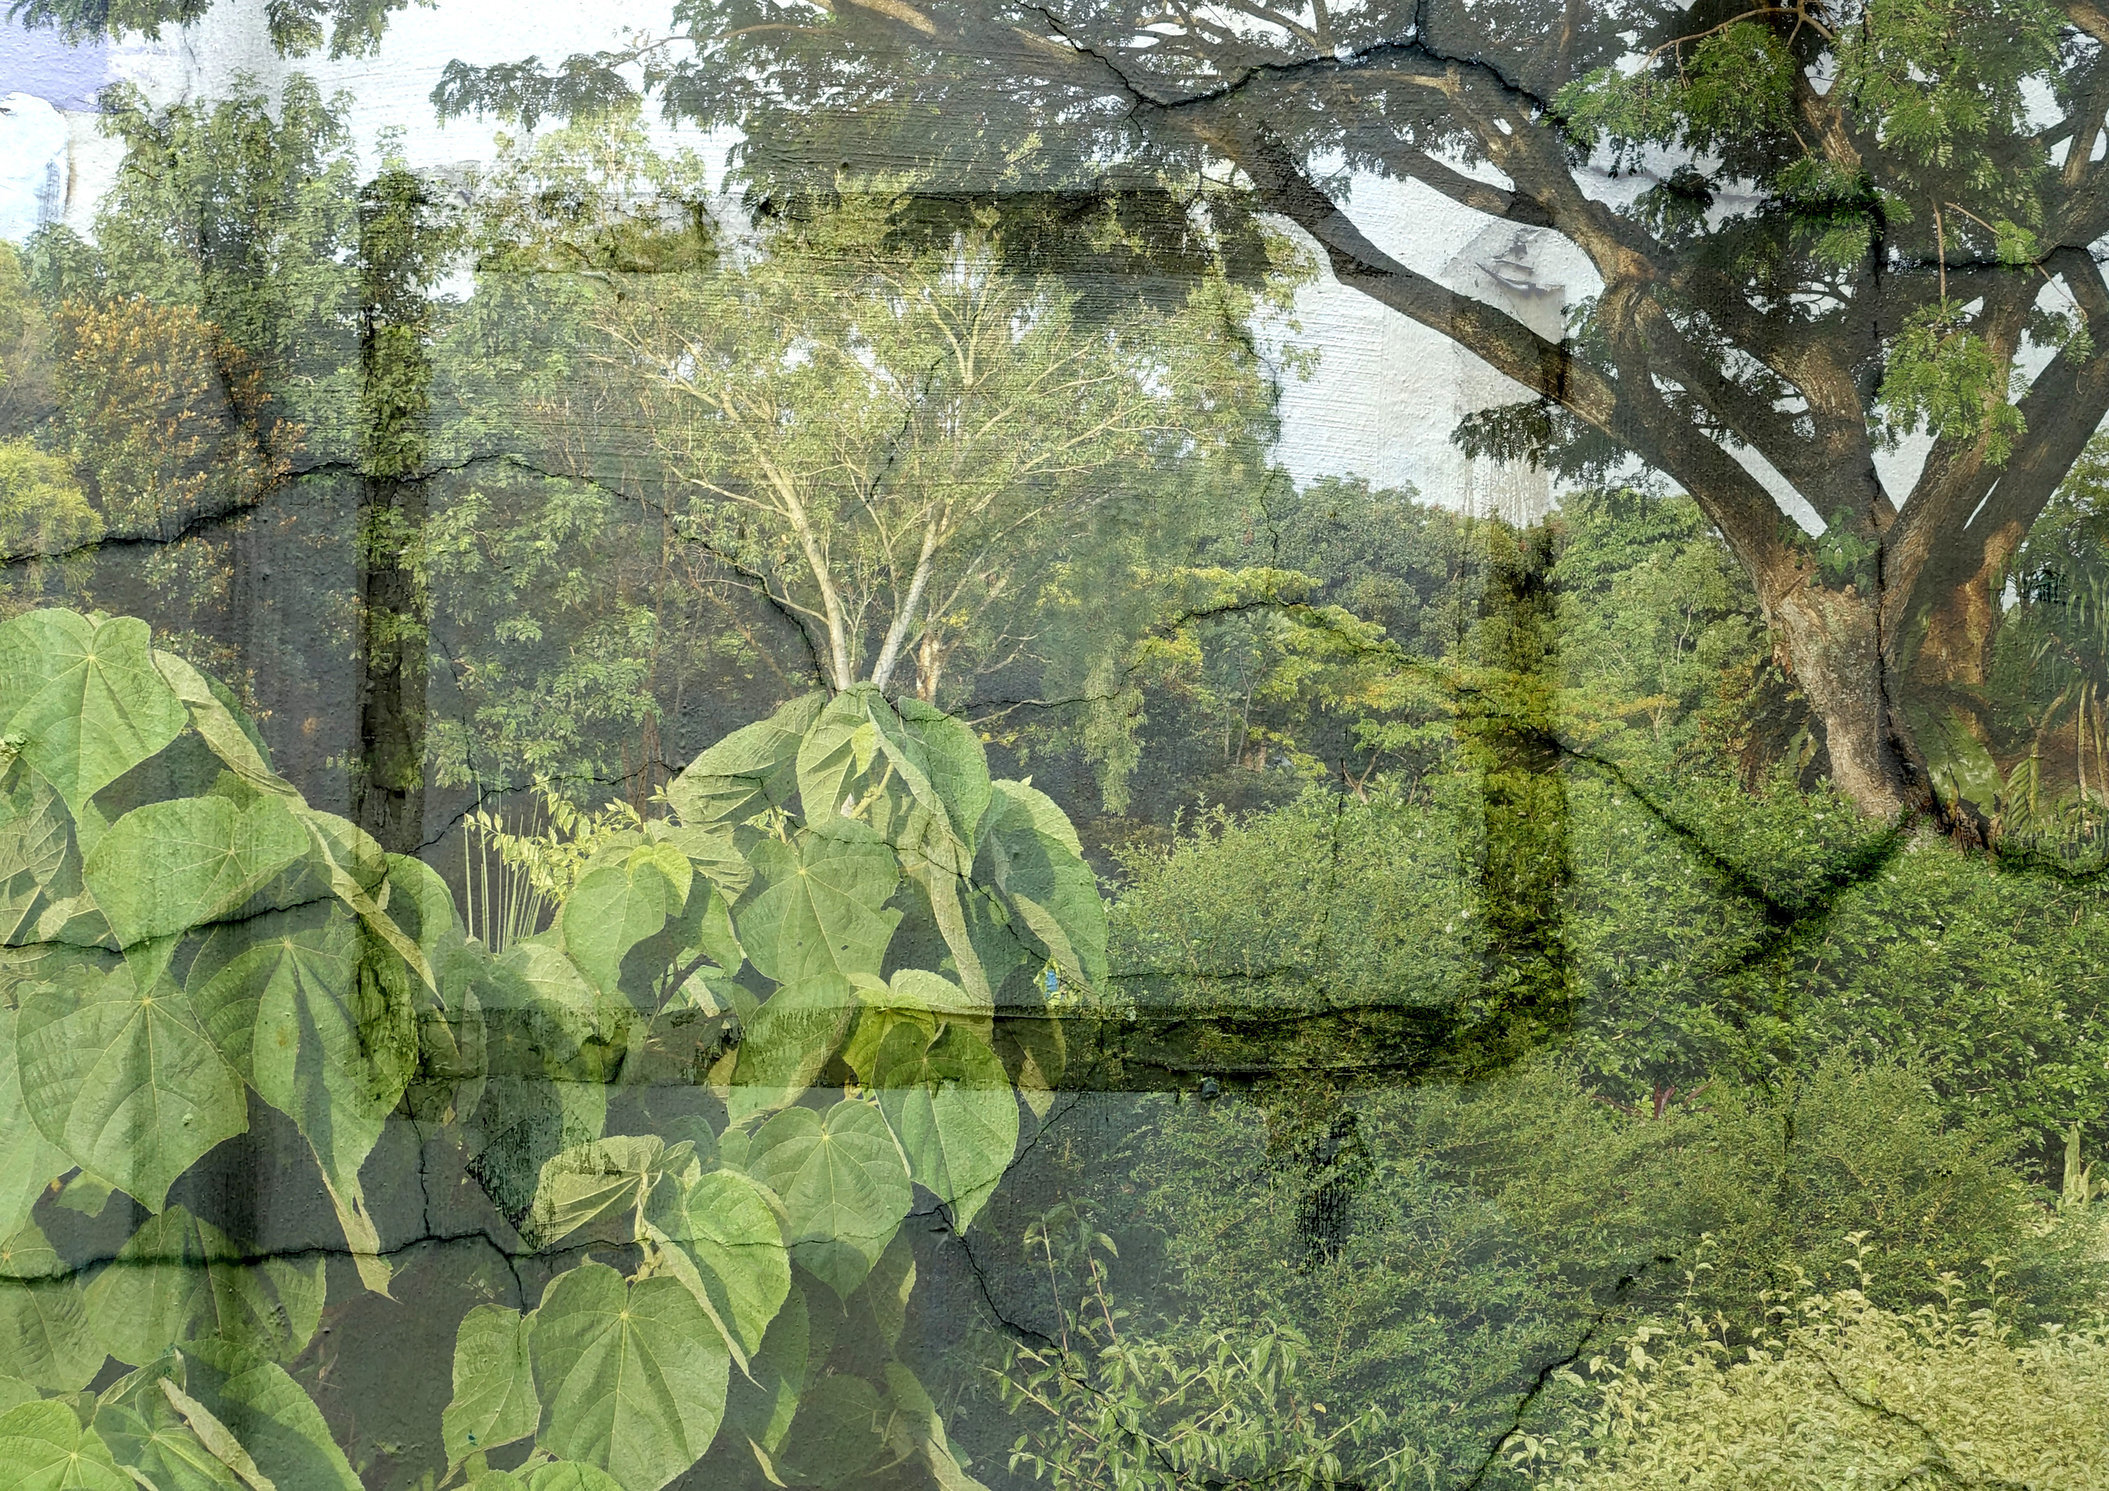 SINGAPORE GREEN 2